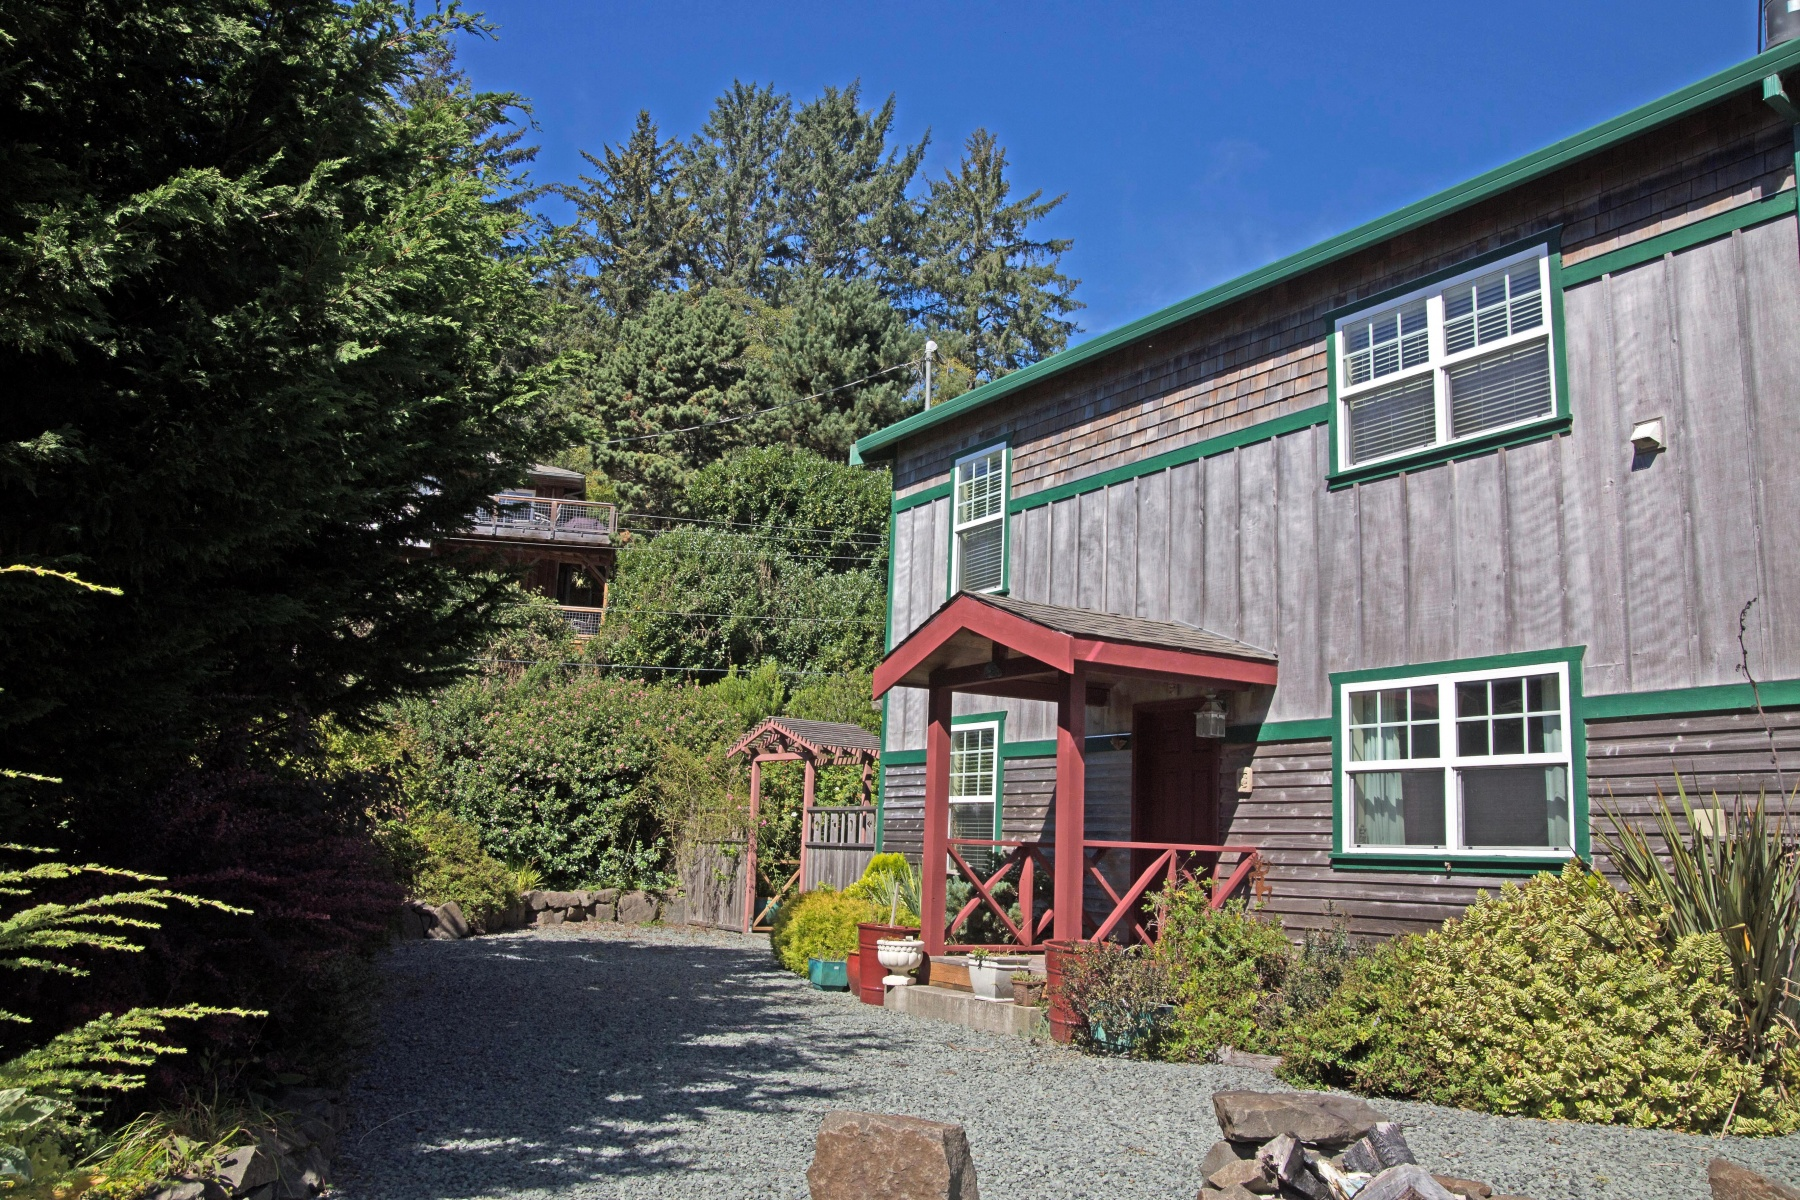 Single Family Home for Sale at 8191 NEHALEM RD, MANZANITA Manzanita, Oregon, 97130 United States